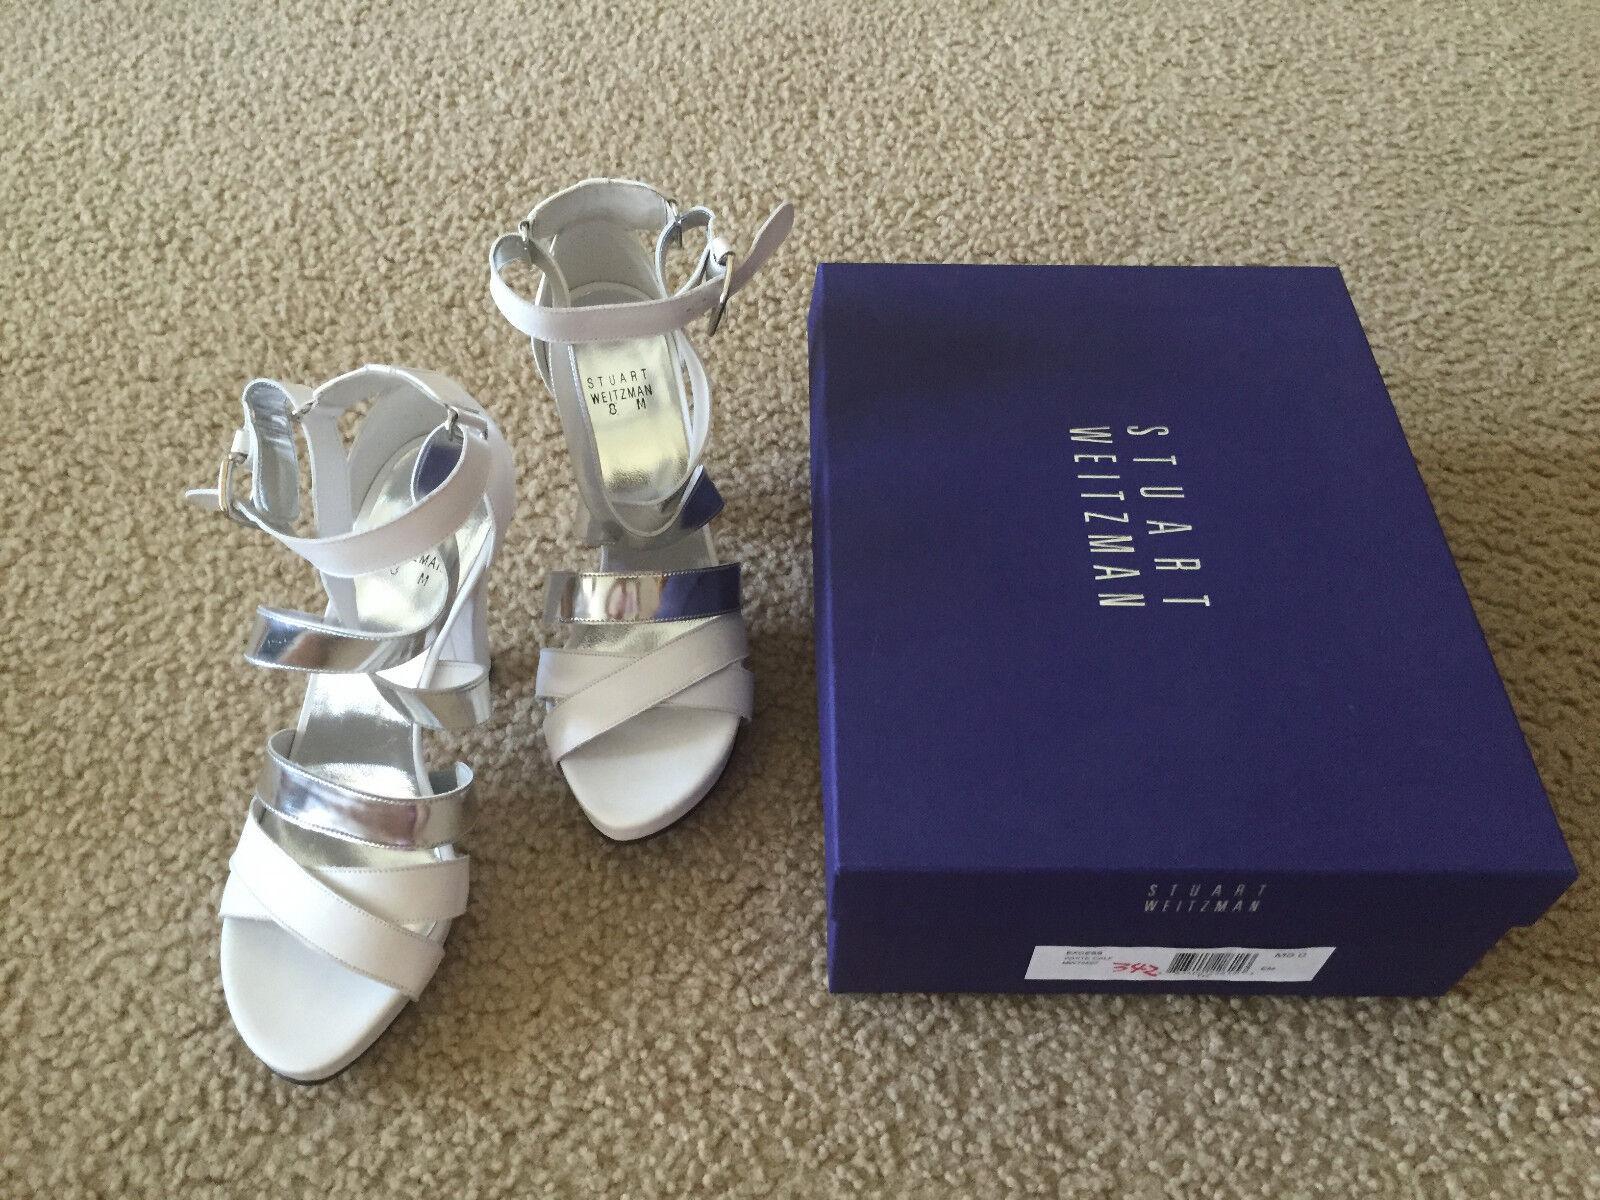 NIB Stuart Weitzman Weitzman Weitzman Excess platform white calf sandal 6.5 7 7.5 8 8.5 c2ee1e